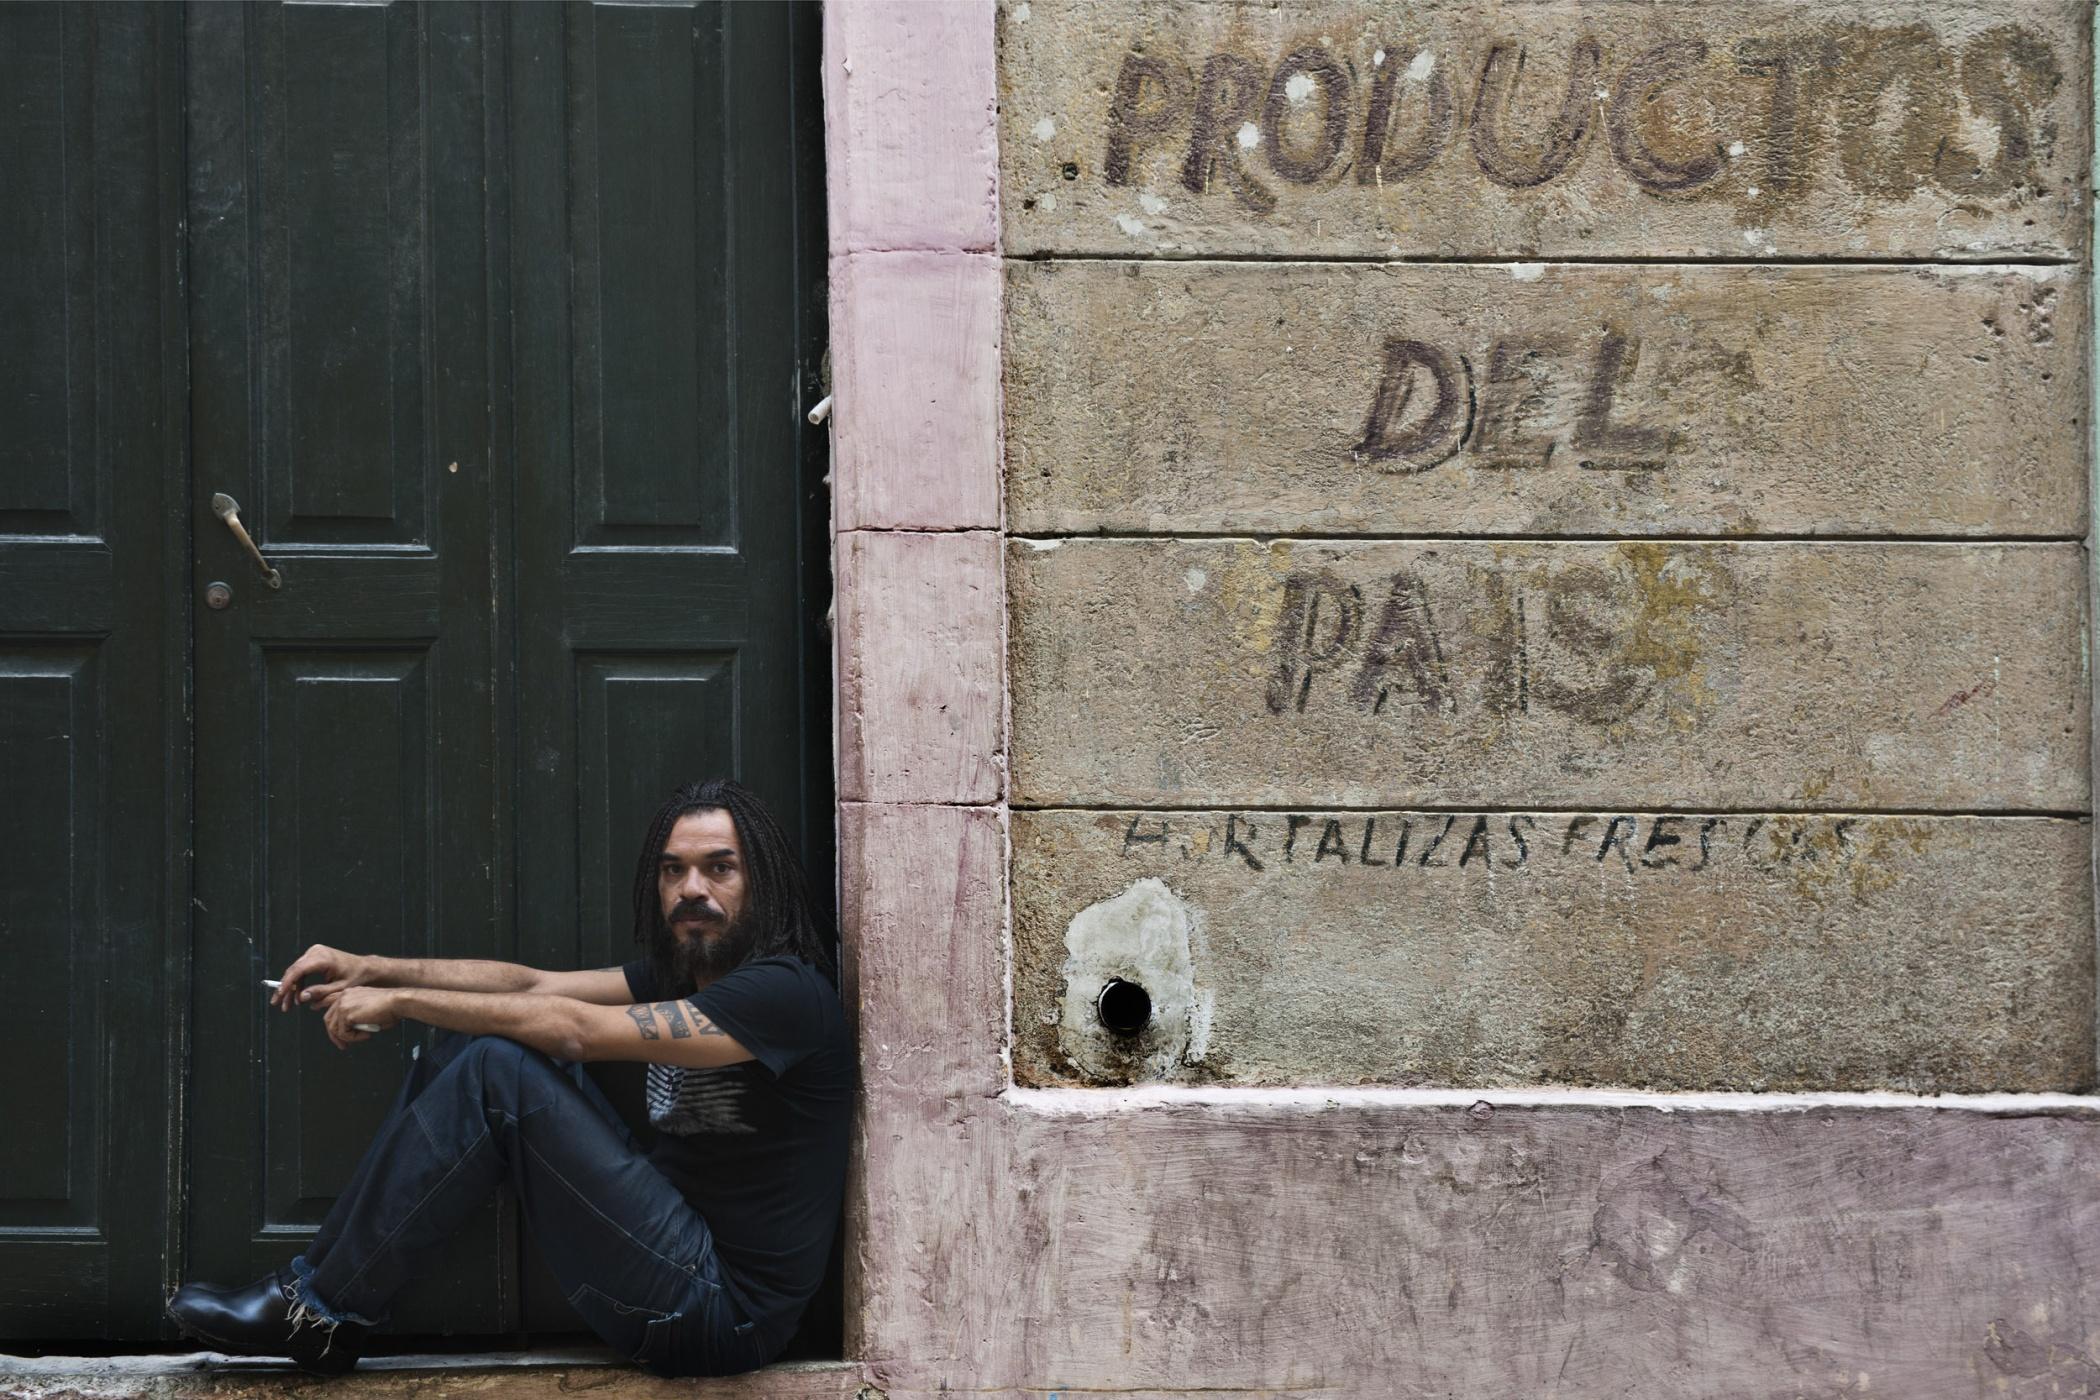 X Alfonso, musician - Illuminated Cuba - Hector Garrido, Aerial and human photography